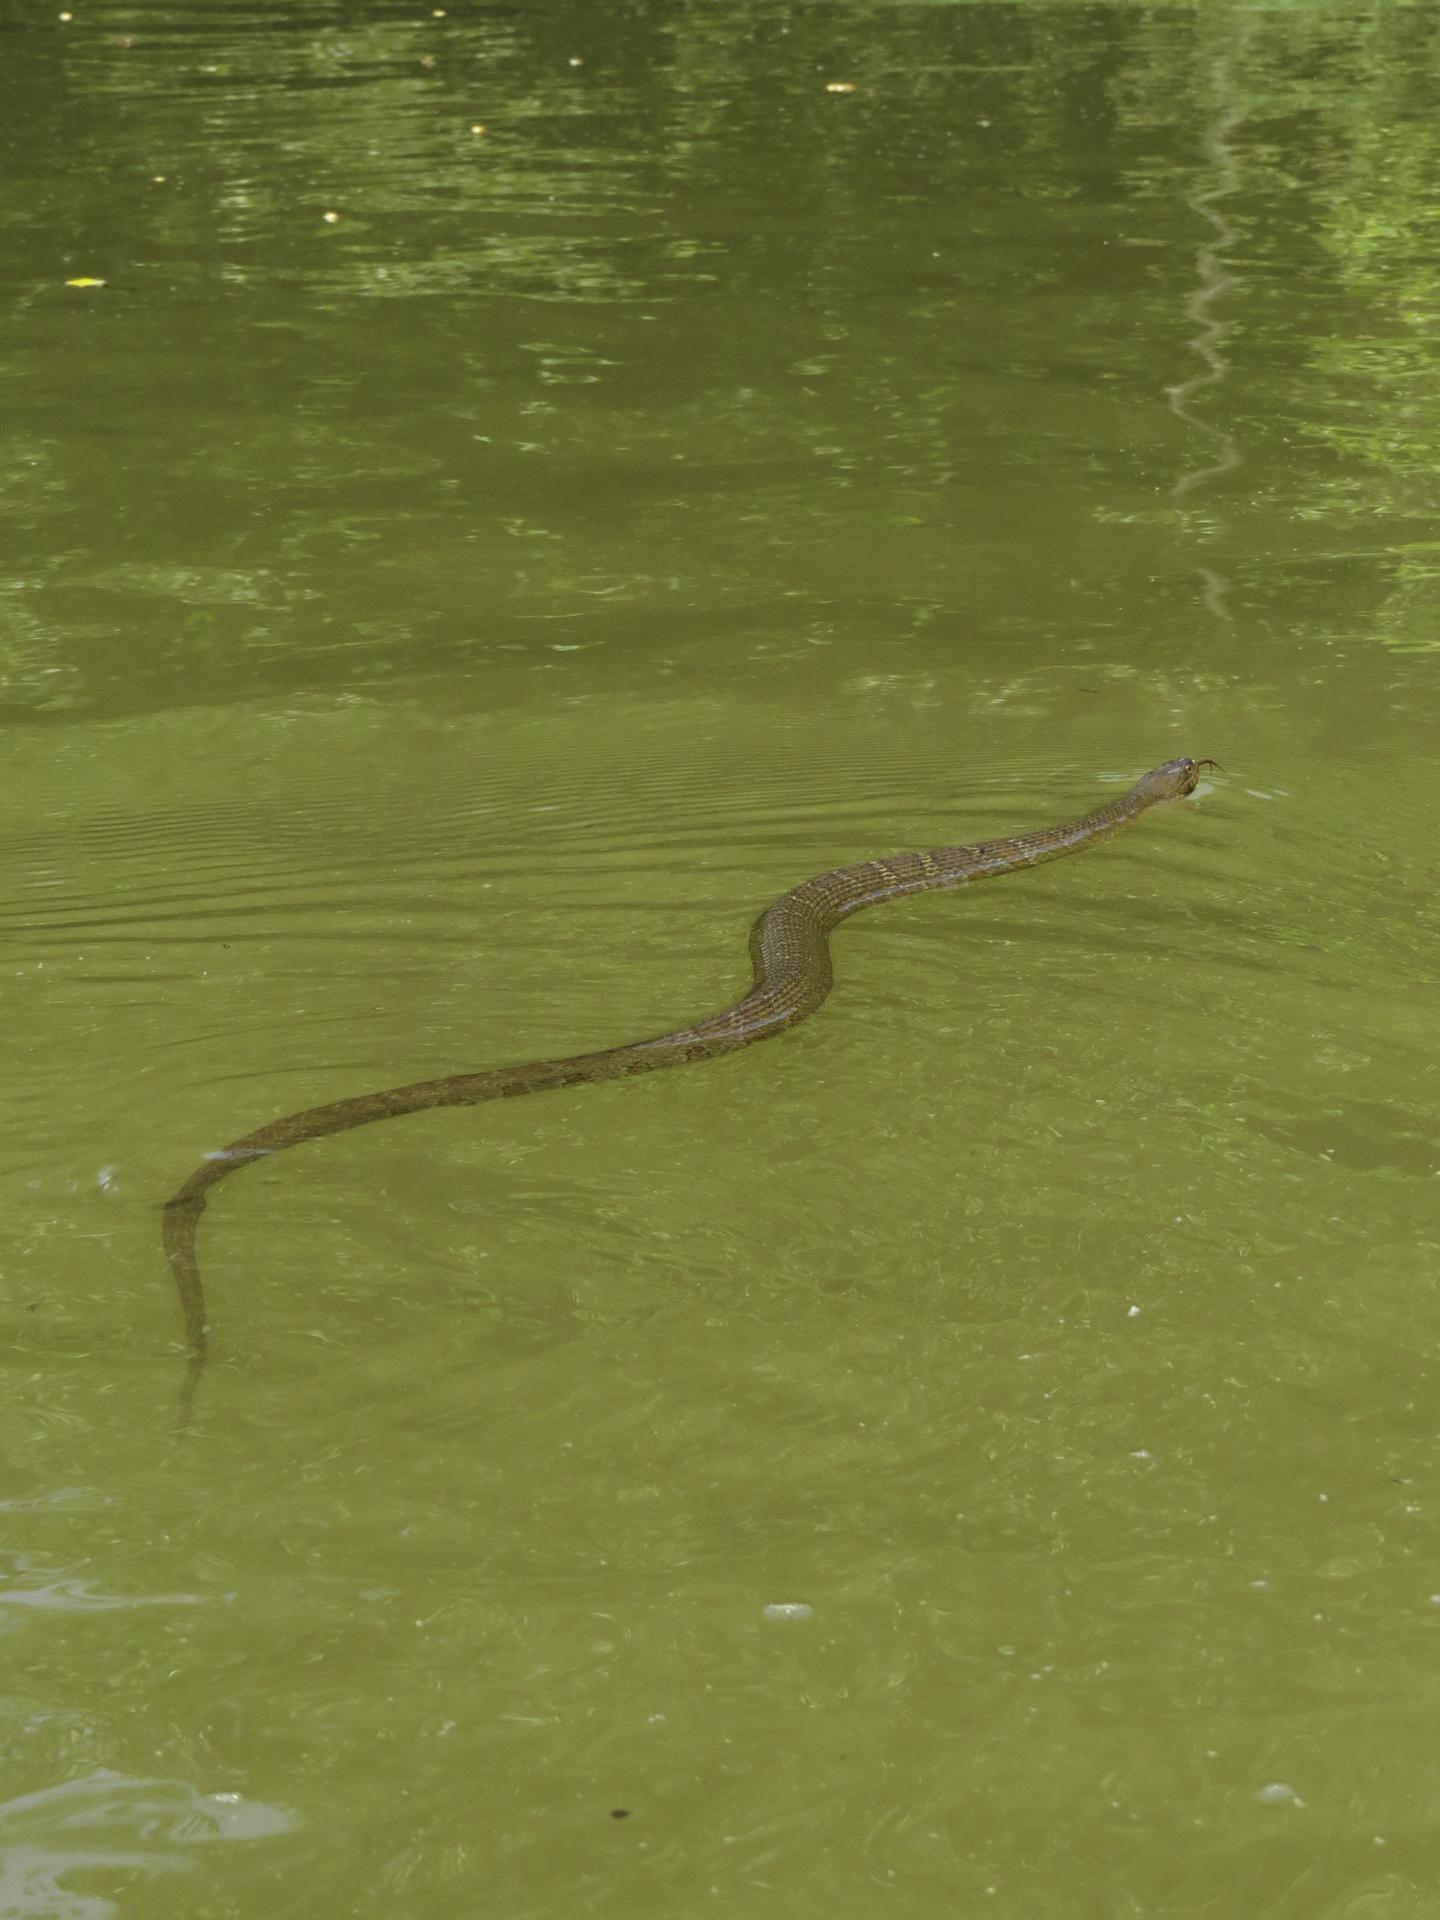 snake-kayaking-maryland-water-nature-outdoors-c&o-canal-potomac-river